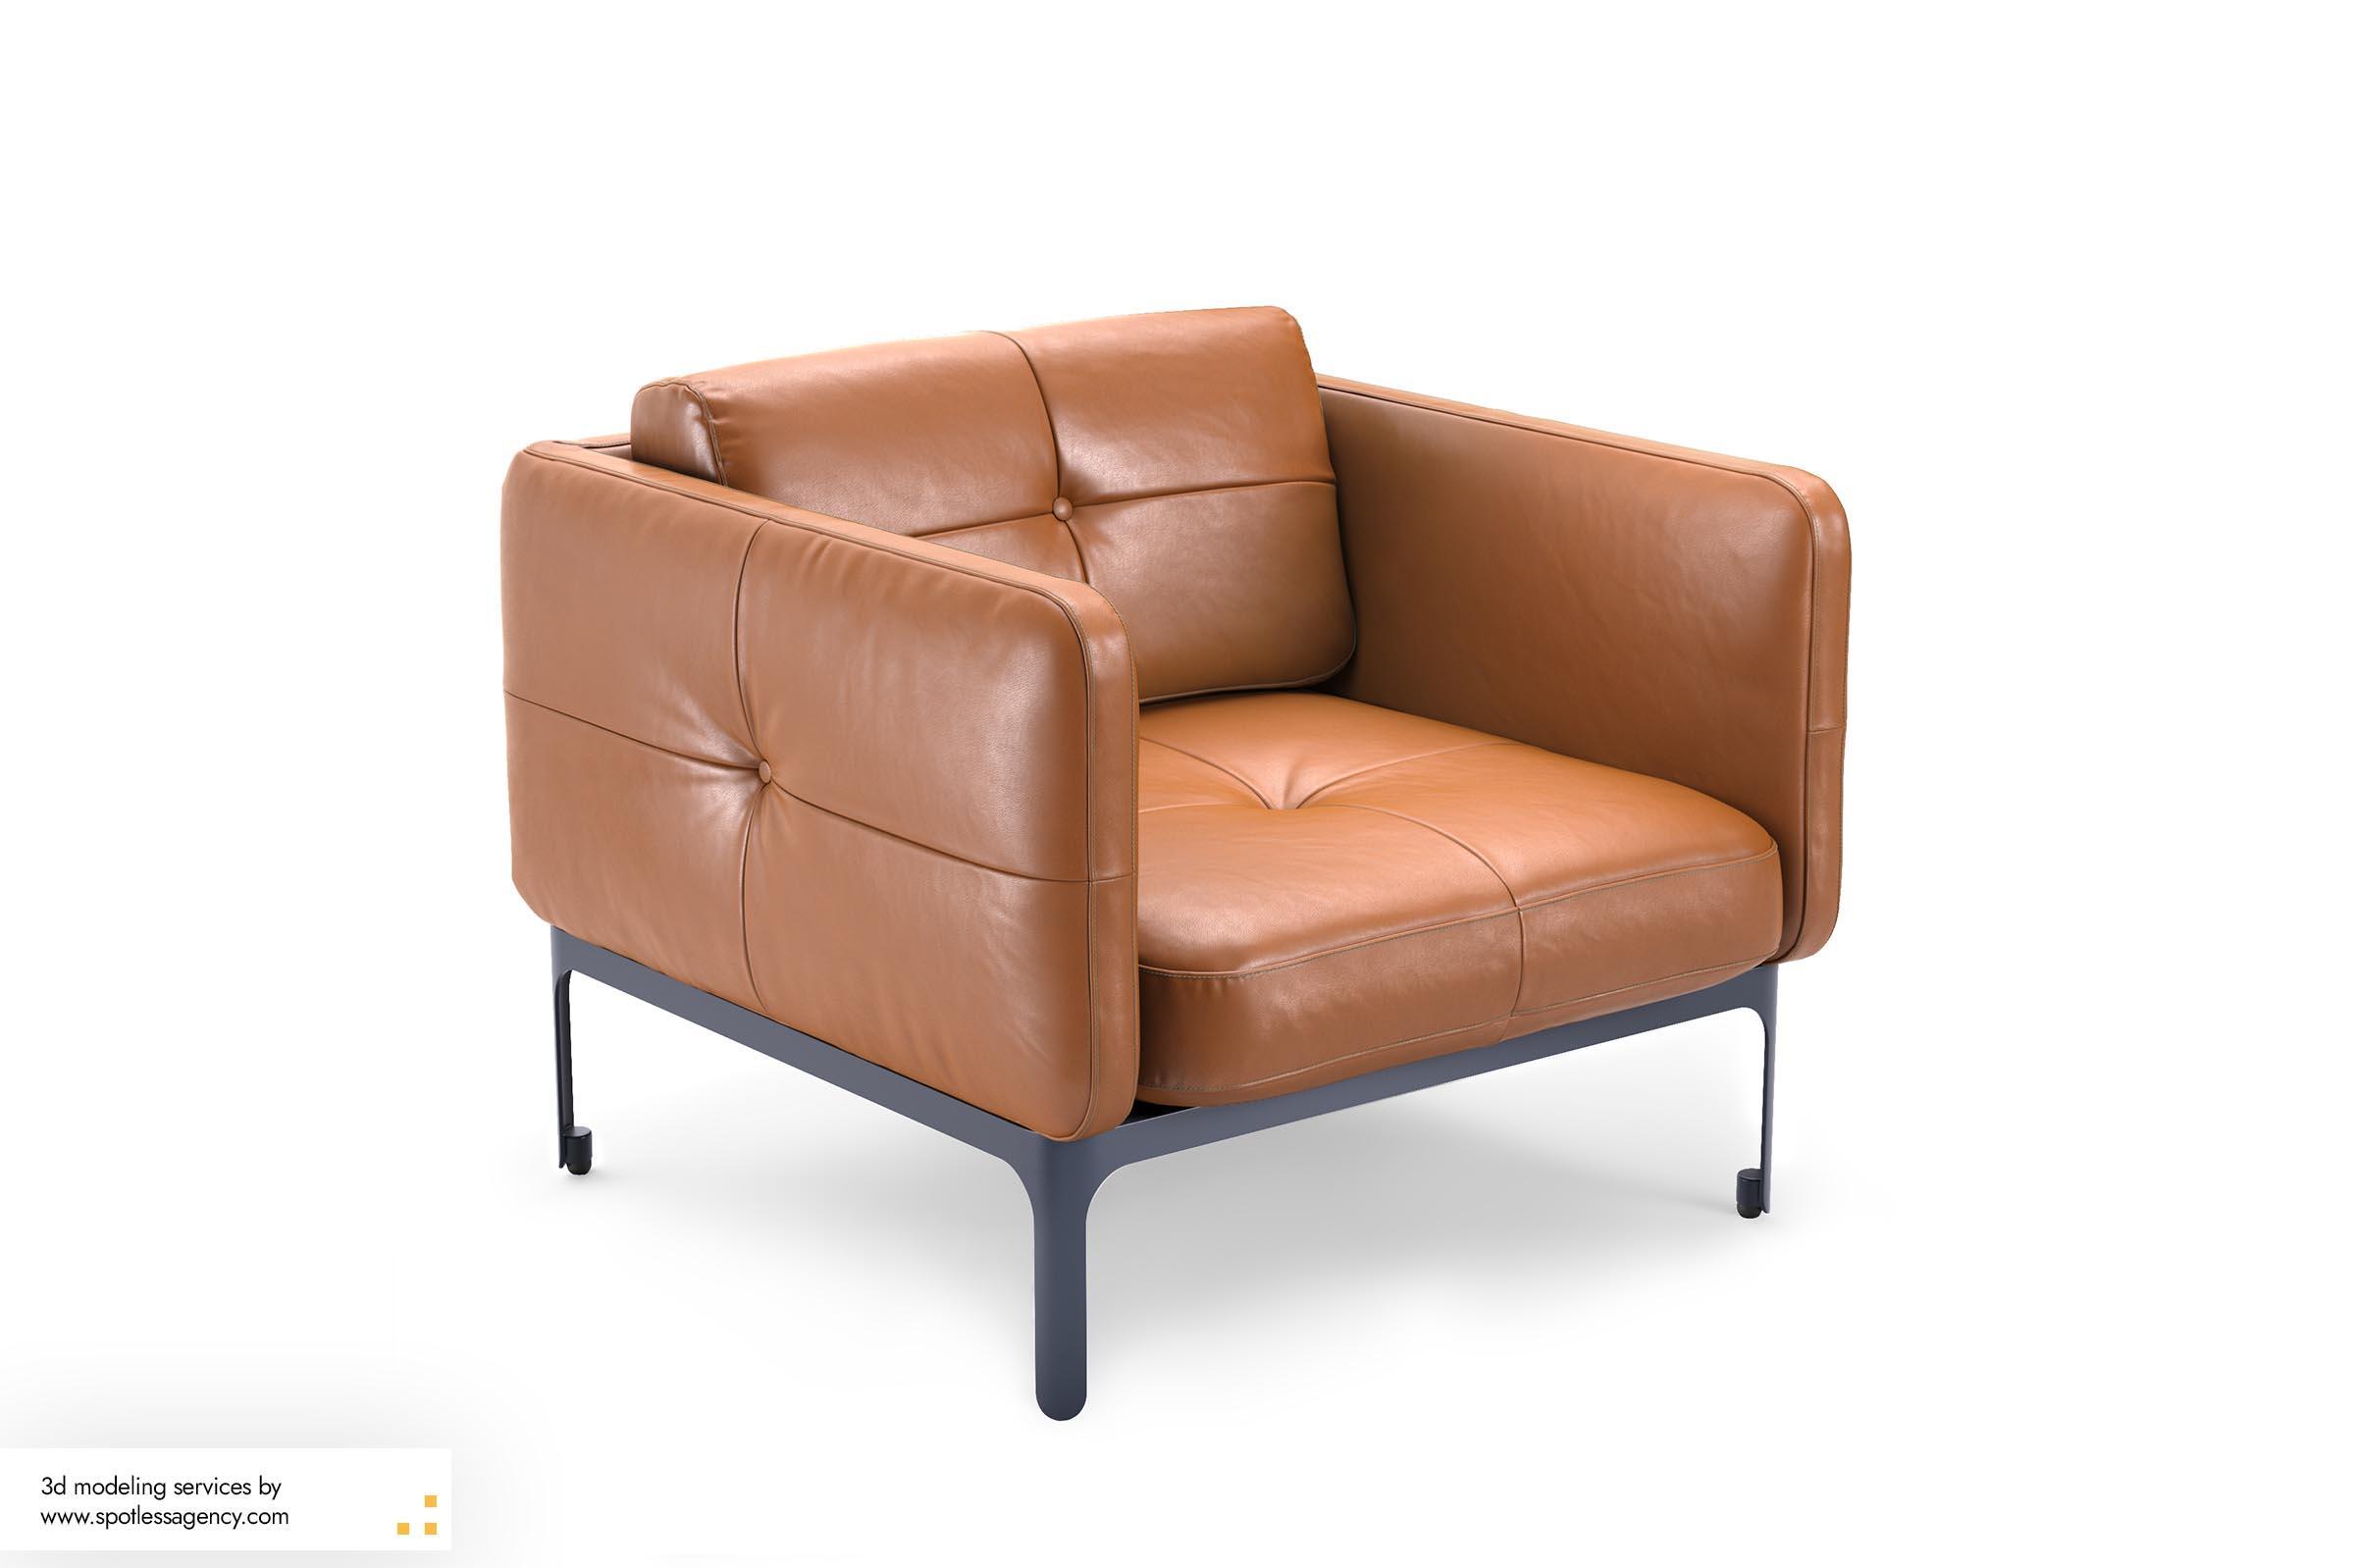 Armchairs 3d Model 5